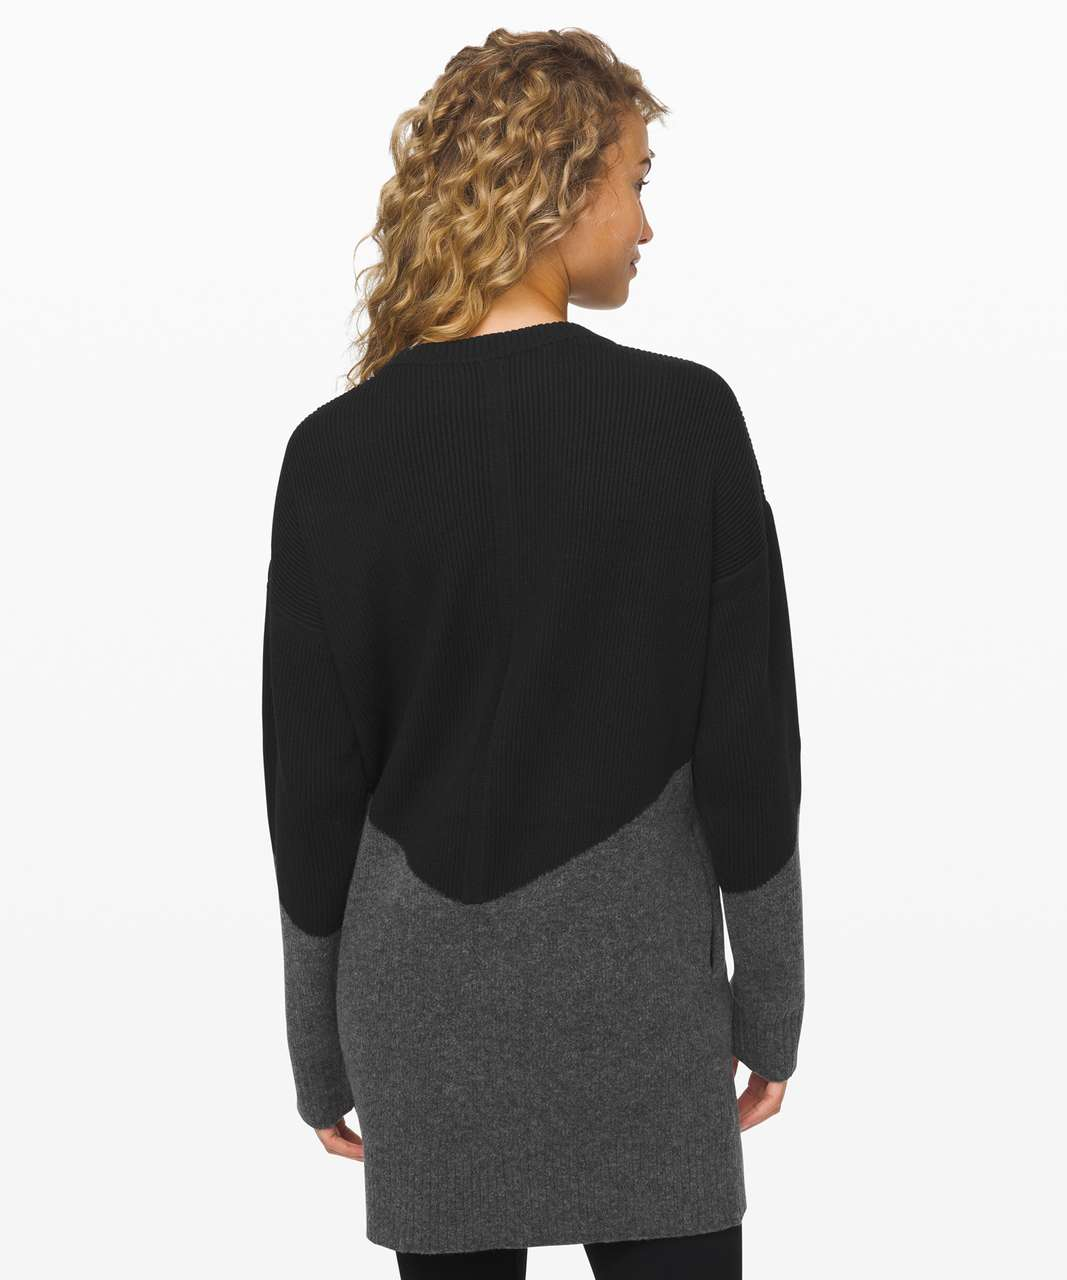 Lululemon Restful Intention Sweater - Black / Heathered Core Dark Grey